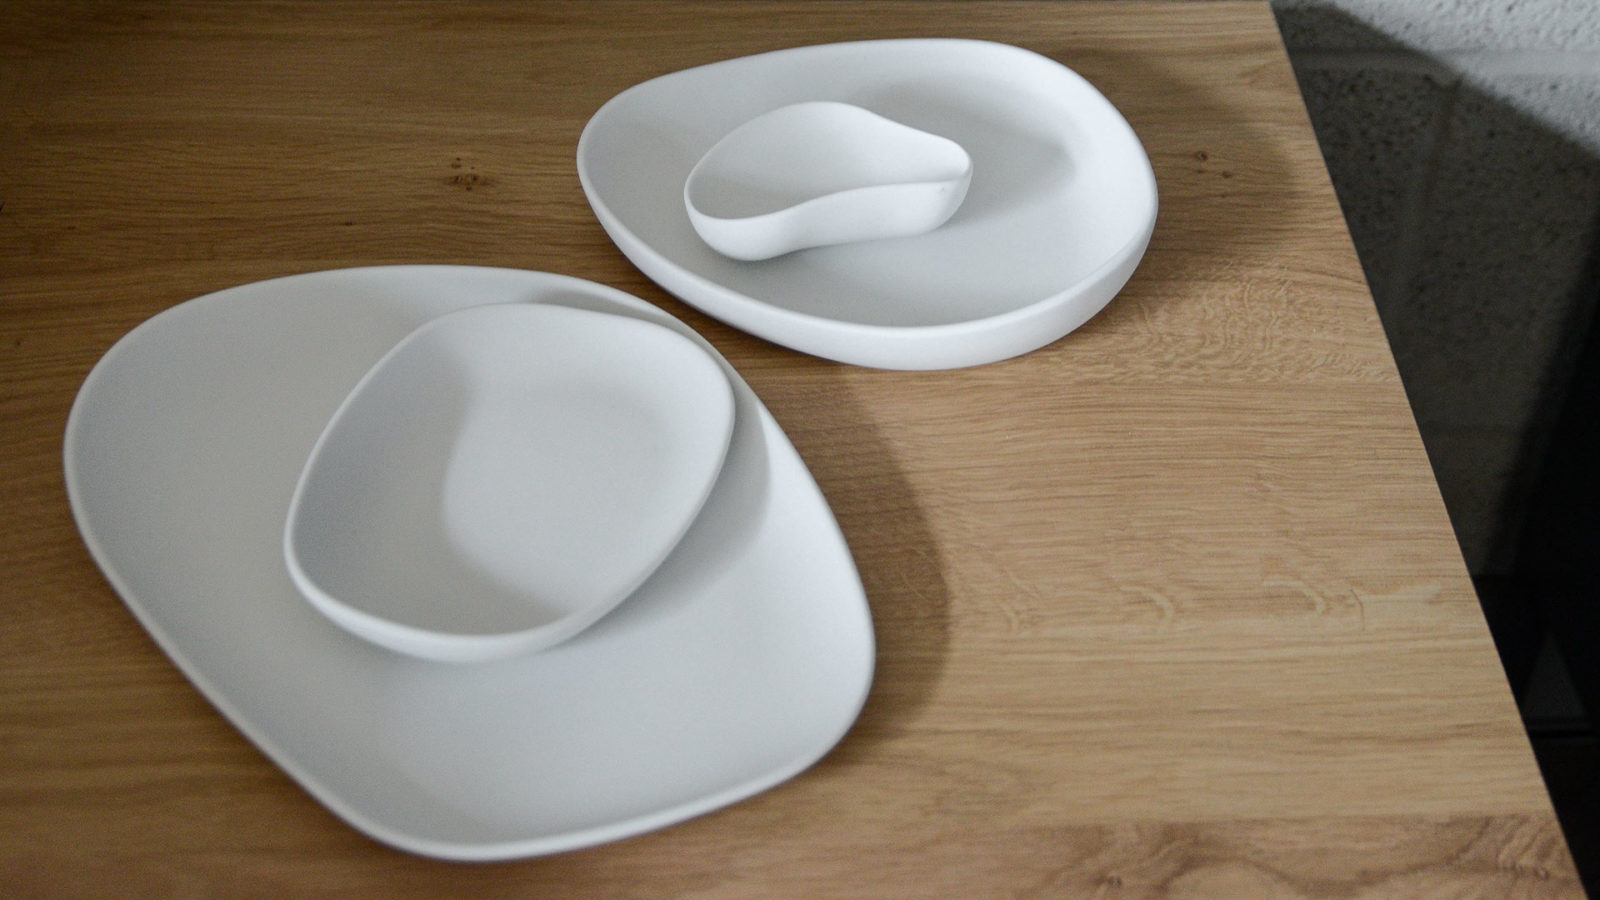 irregular shaped tableware in matte white porcelain